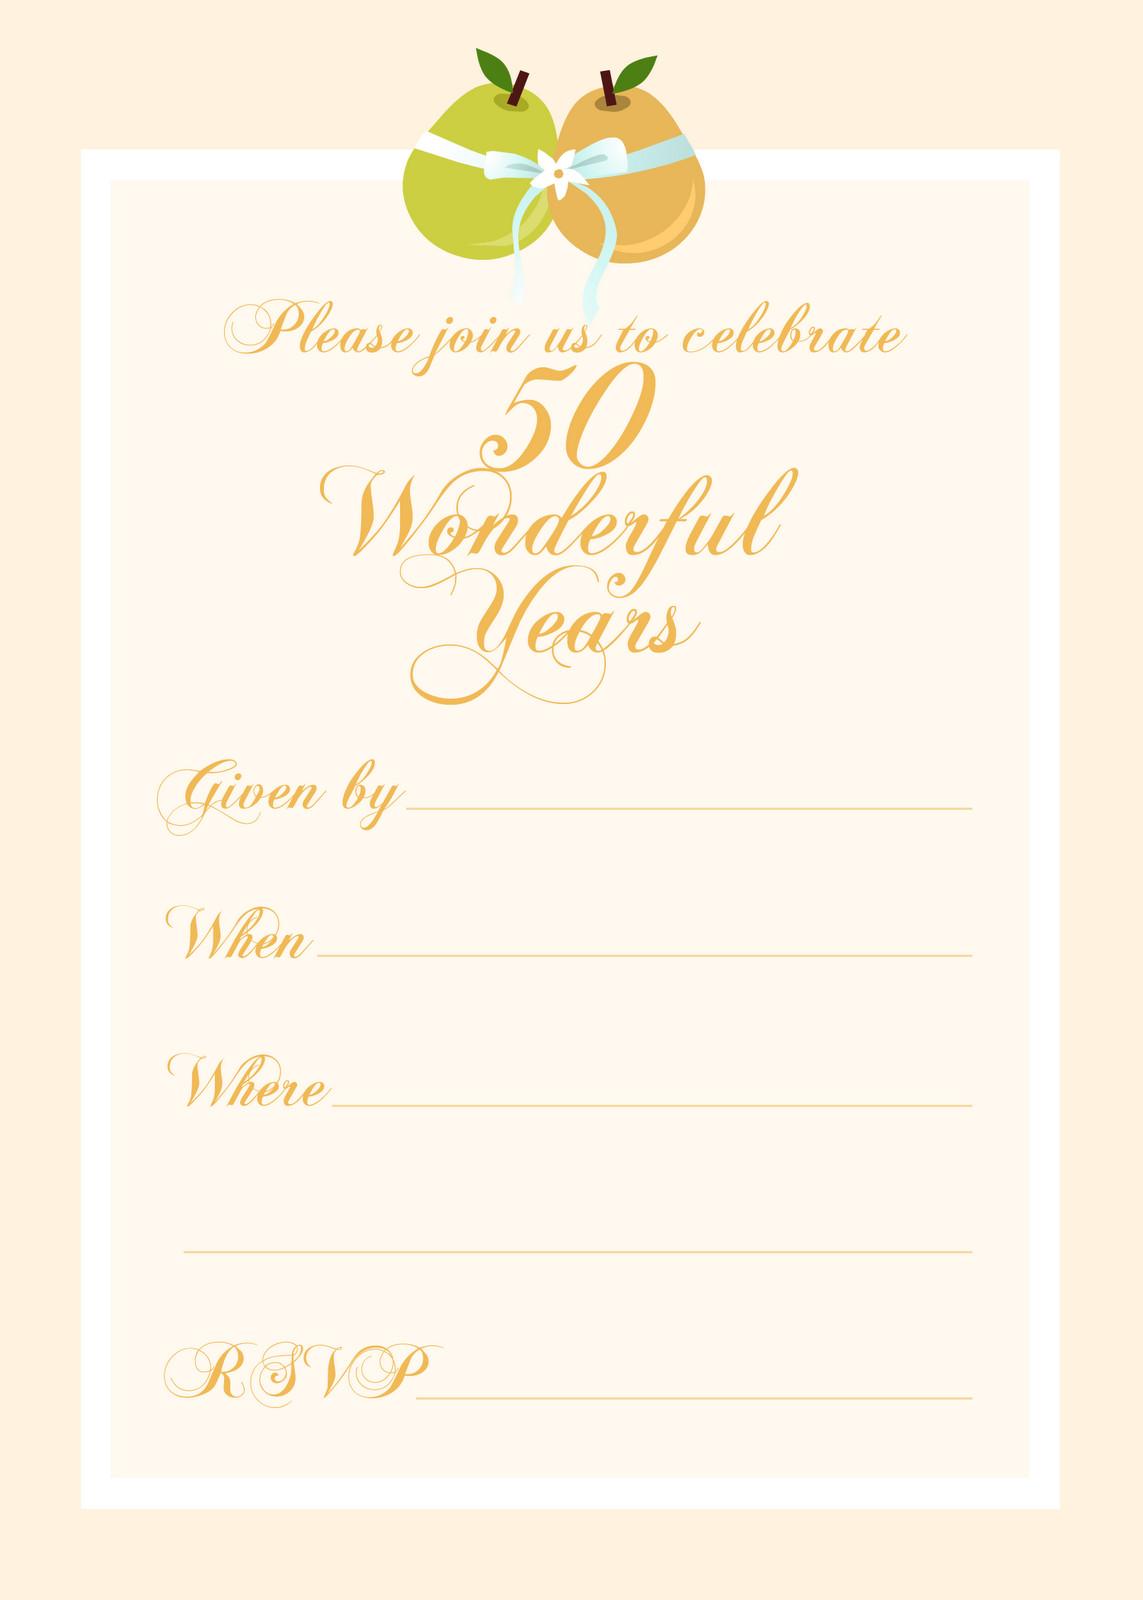 50th Anniversary Invitations Templates Free Printable Party Invitations Free 50th Wedding